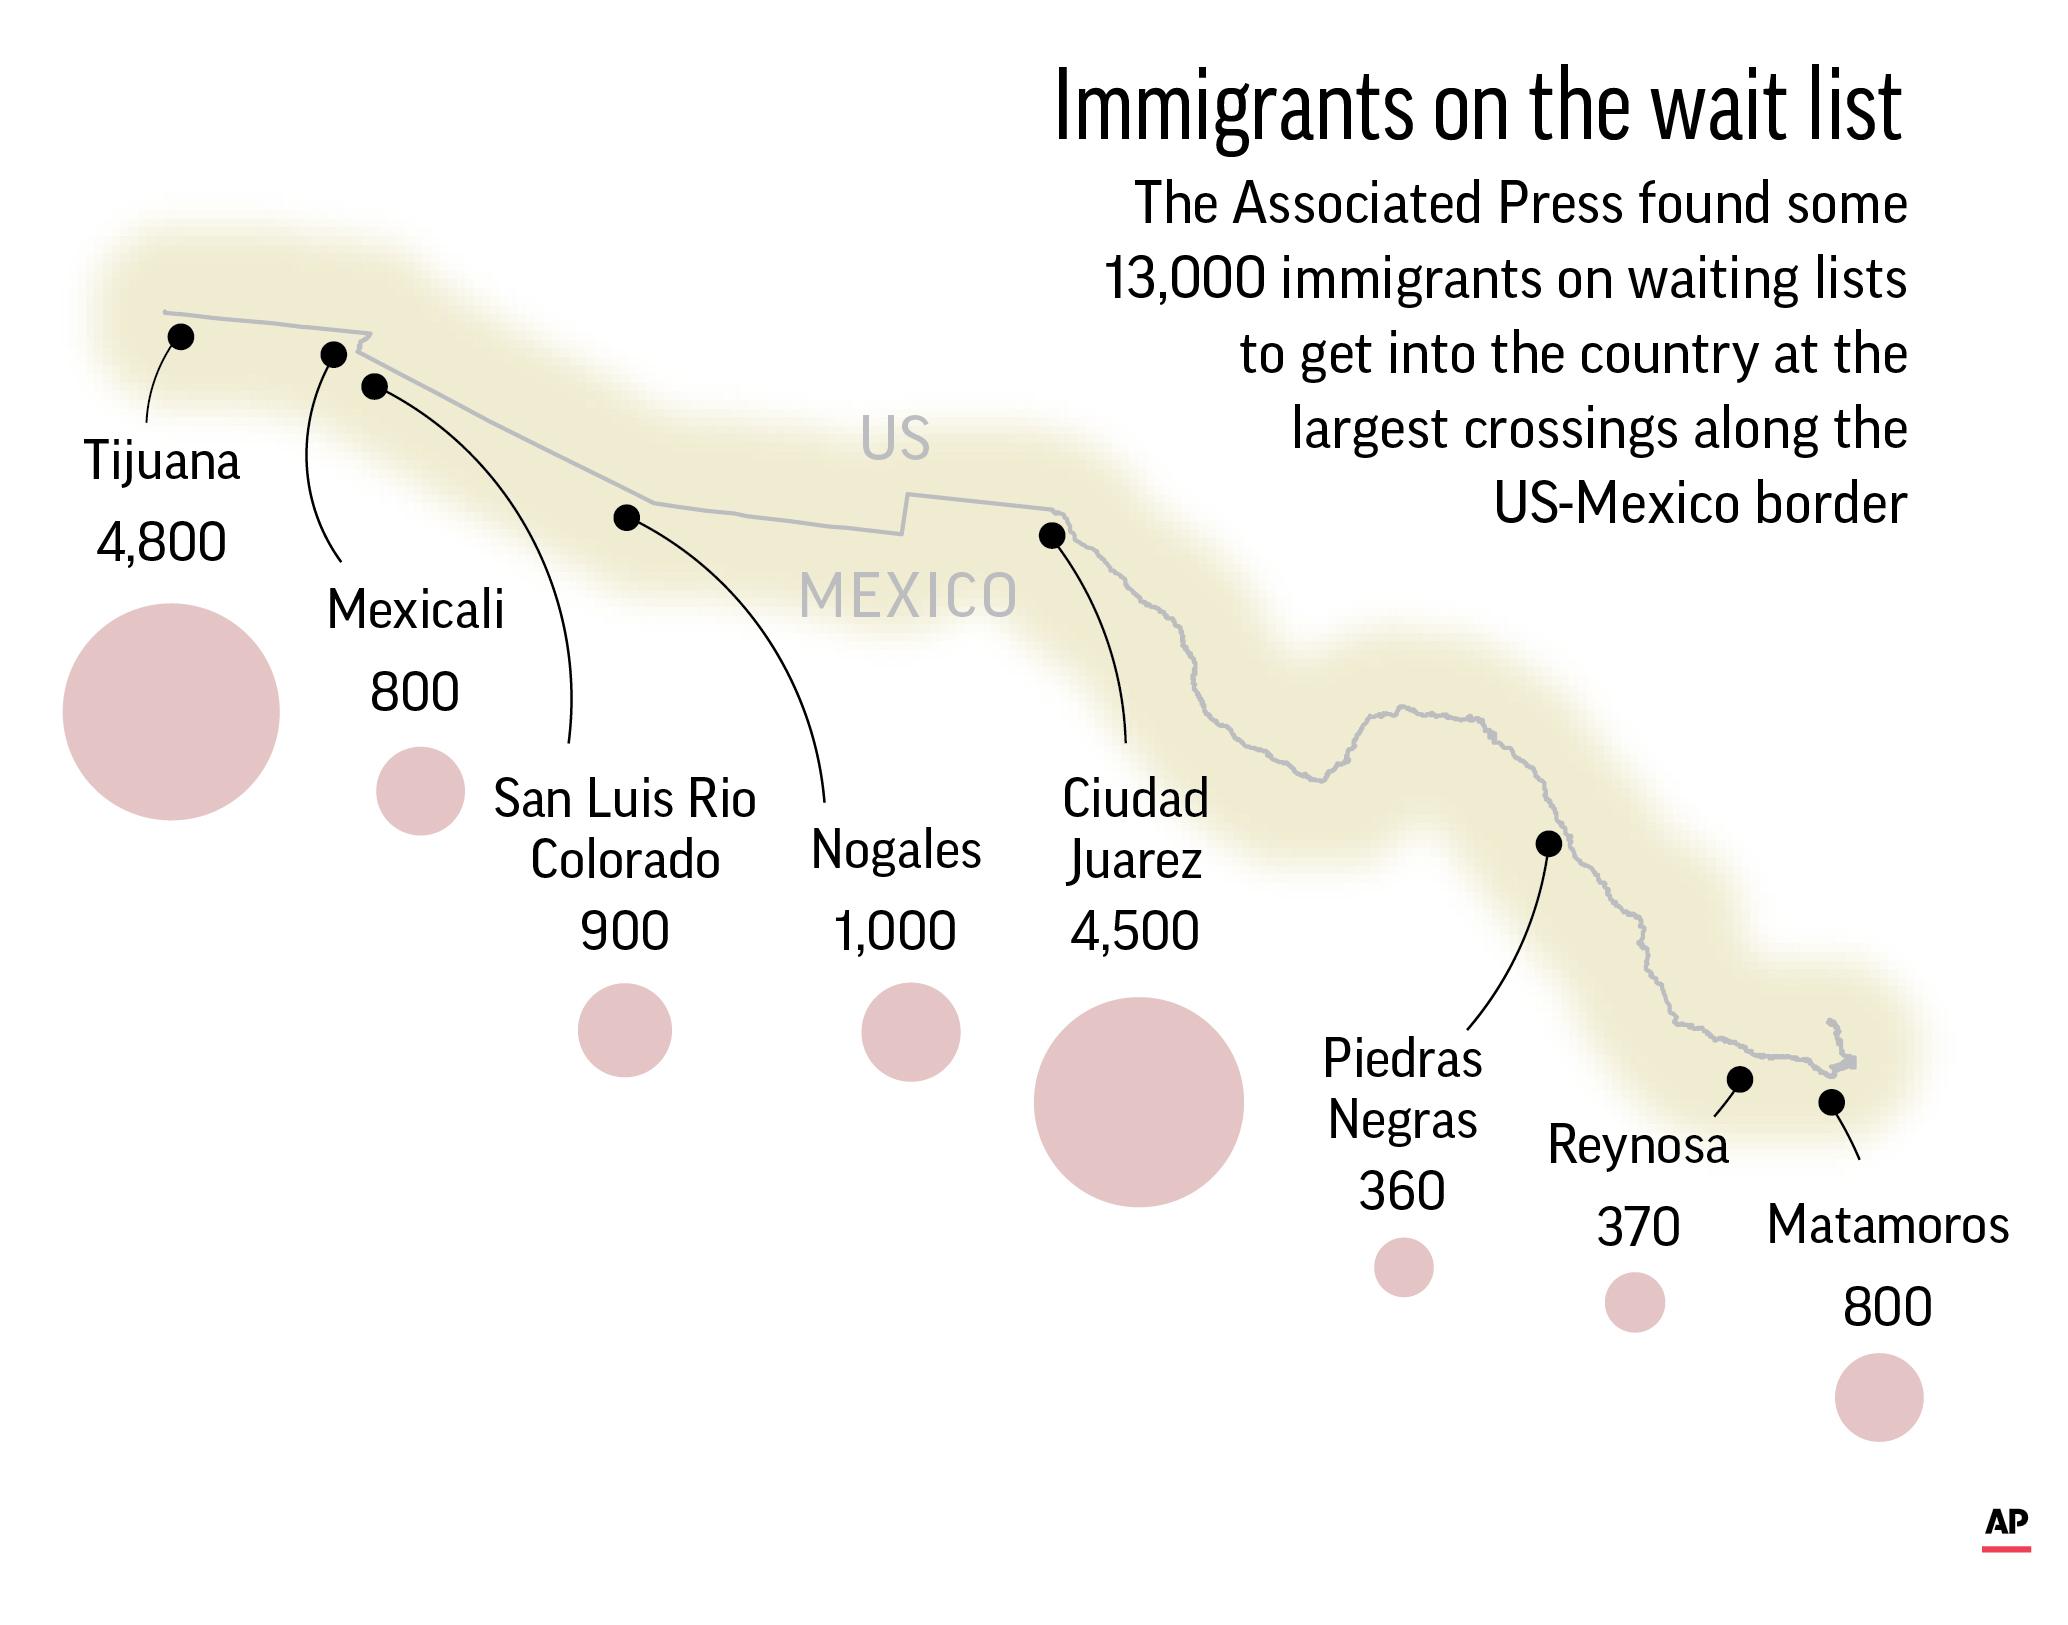 US MEXICO WAIT LIST.jpg